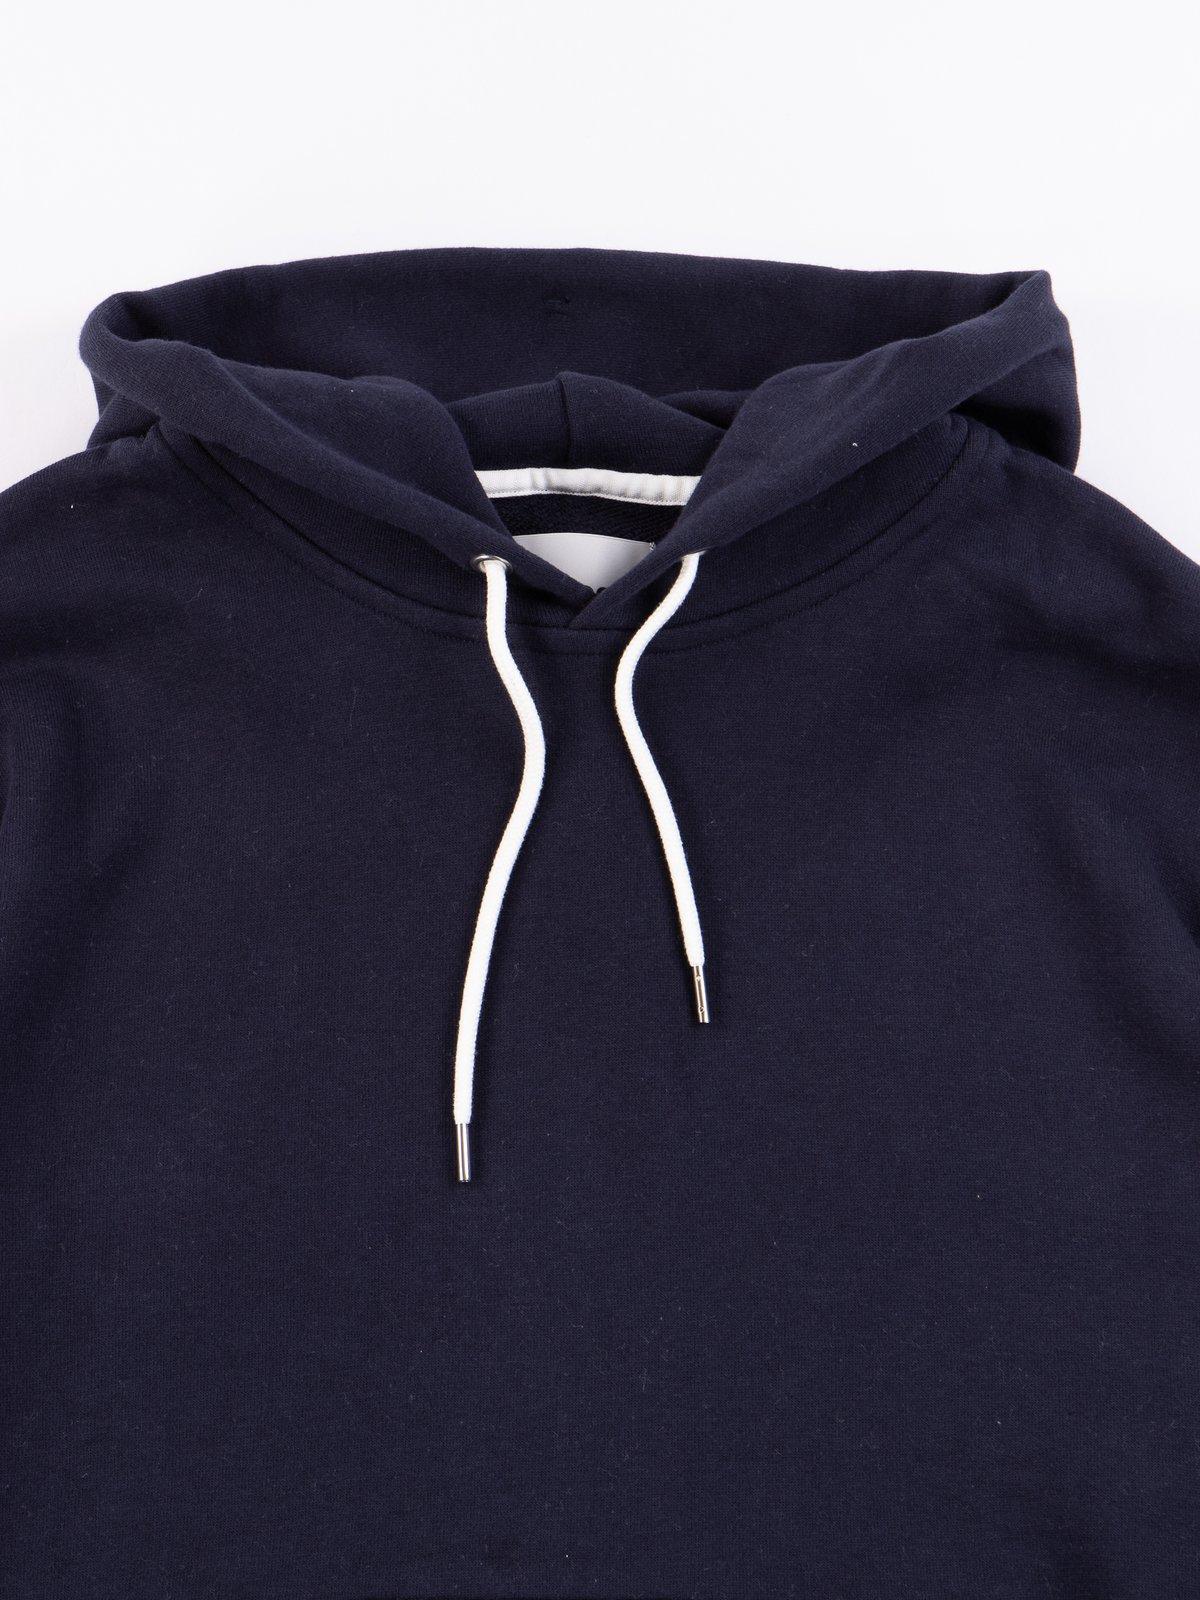 Navy Pullover Hoodie - Image 2